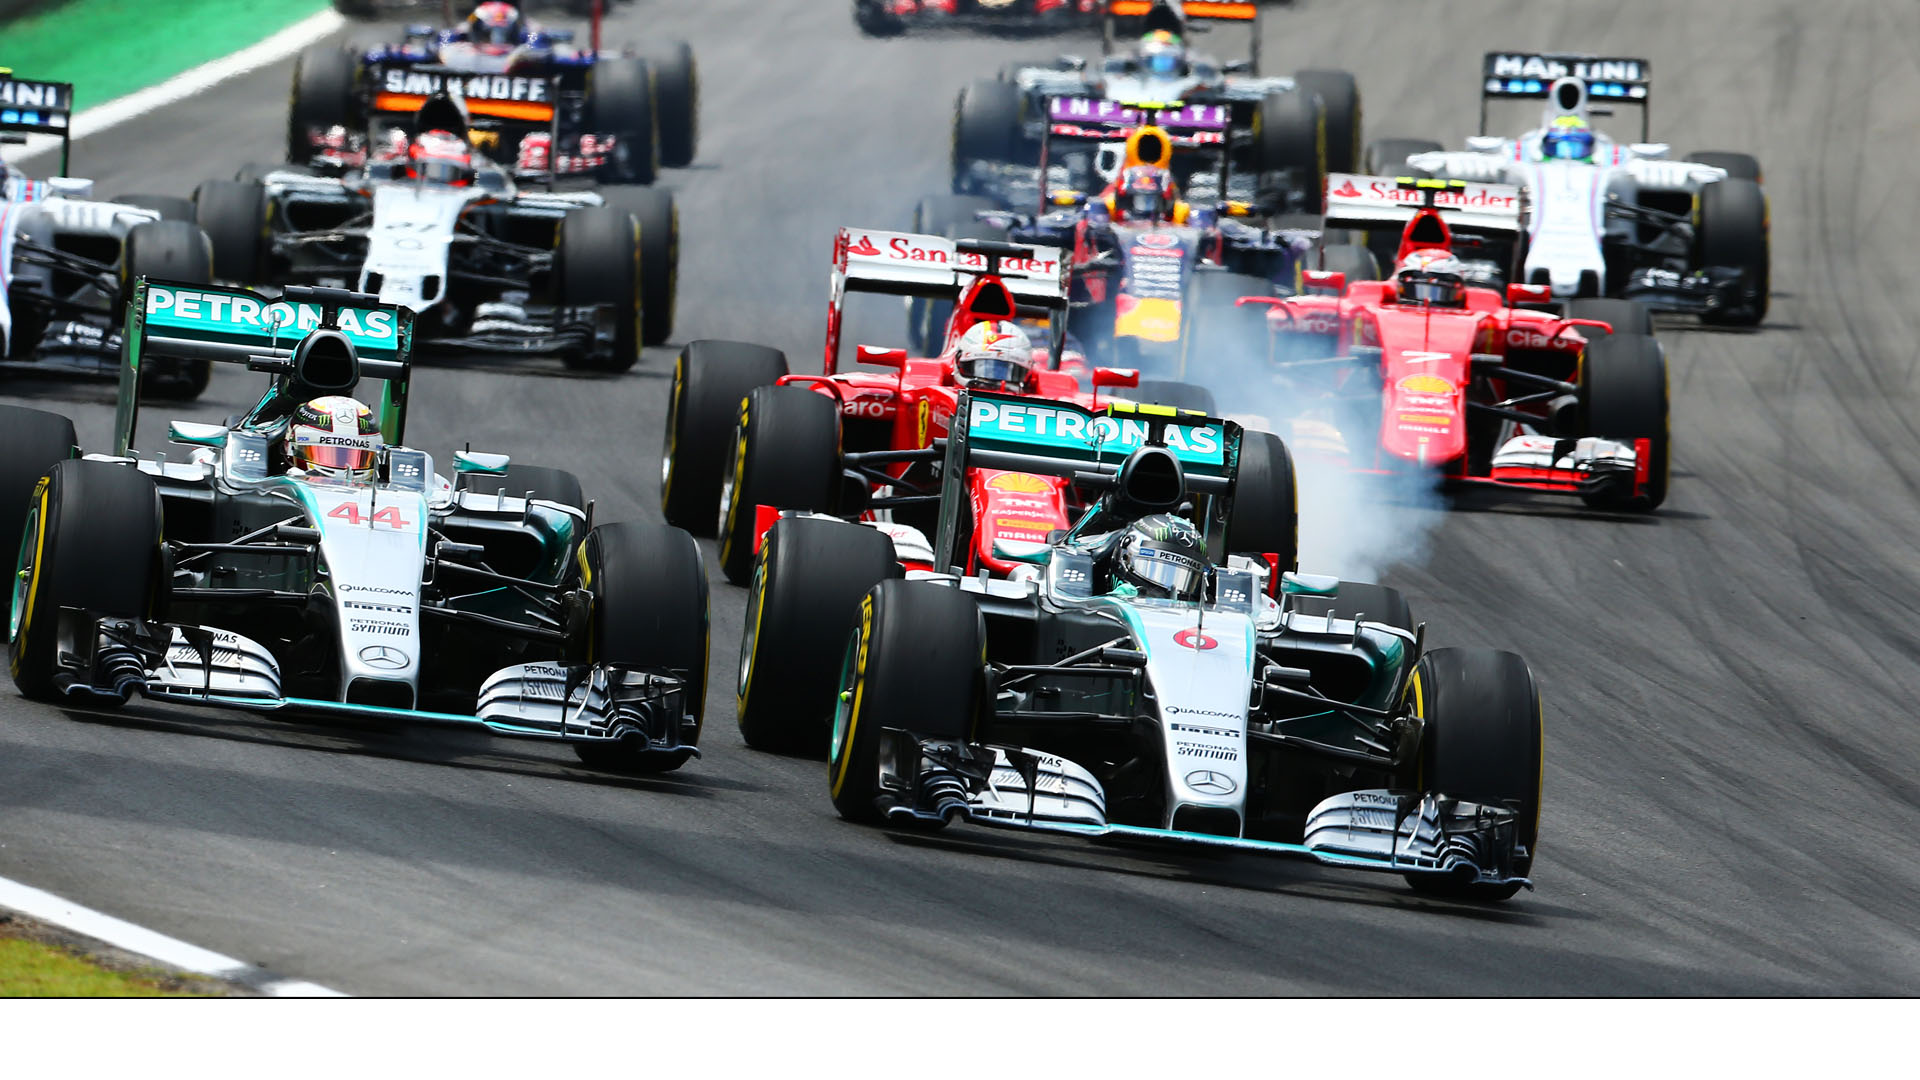 Apple apostaría por la Fórmula 1